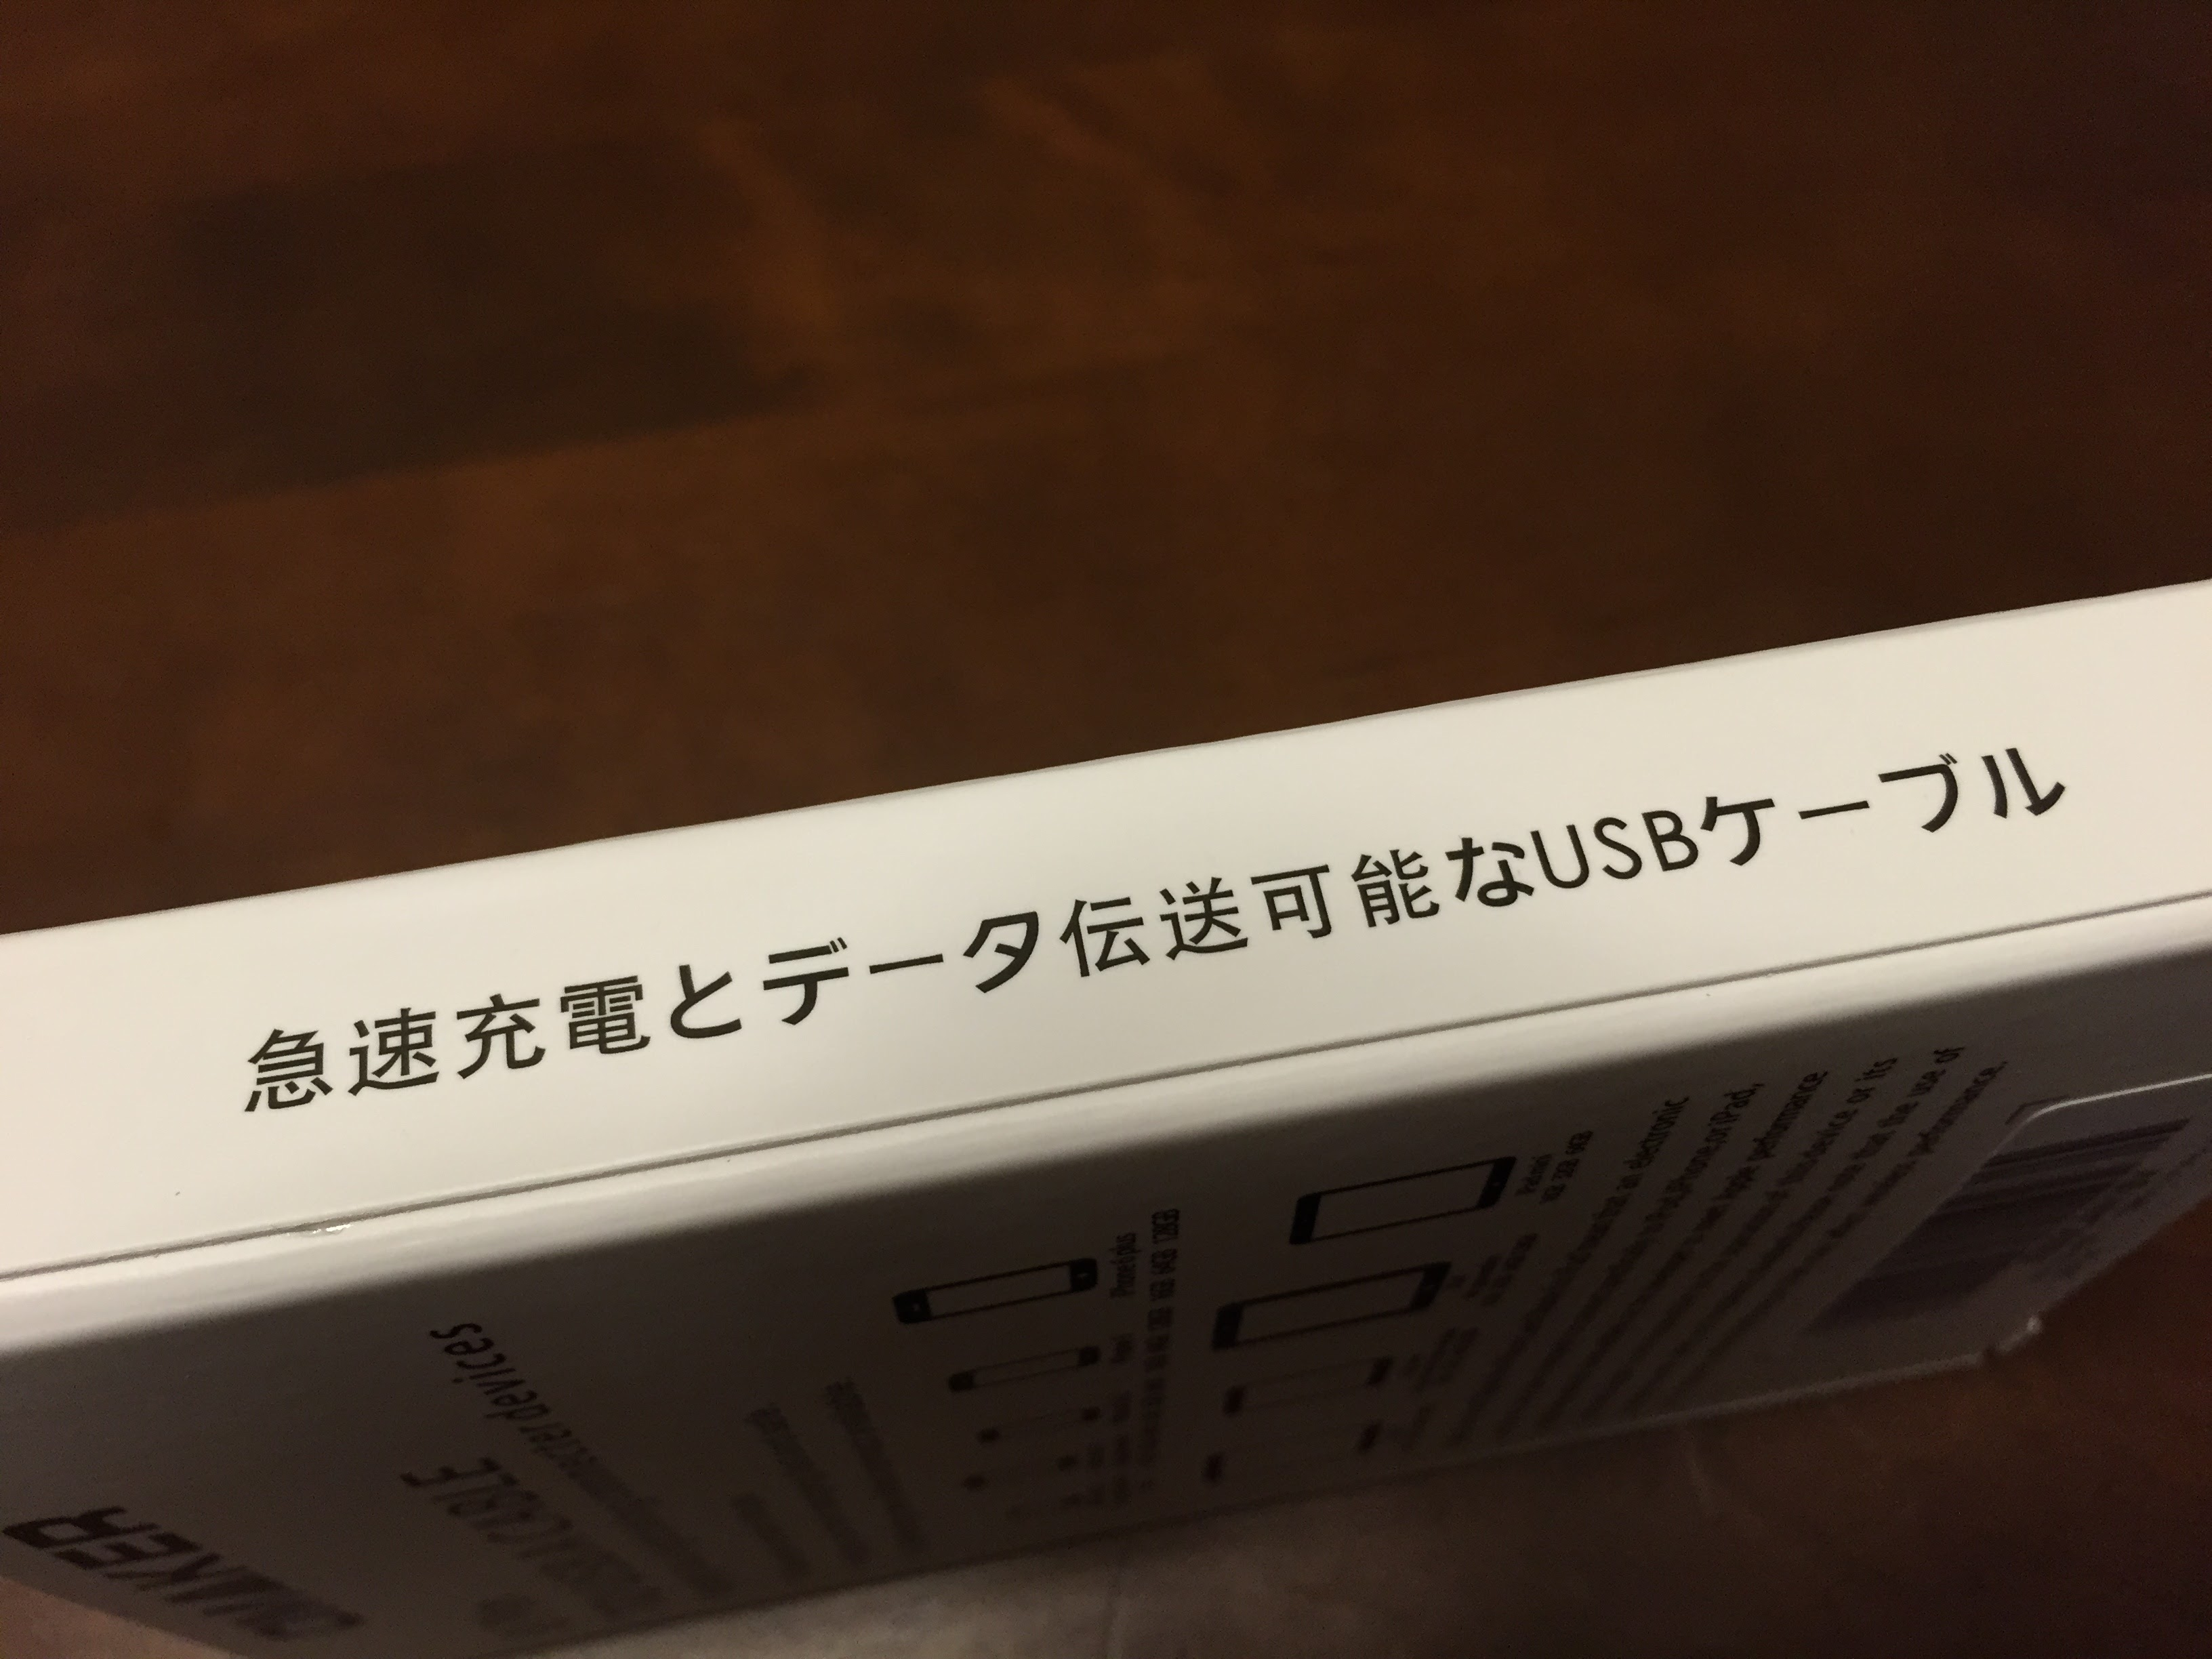 0918-201507_Omaker Lightning Cable 02